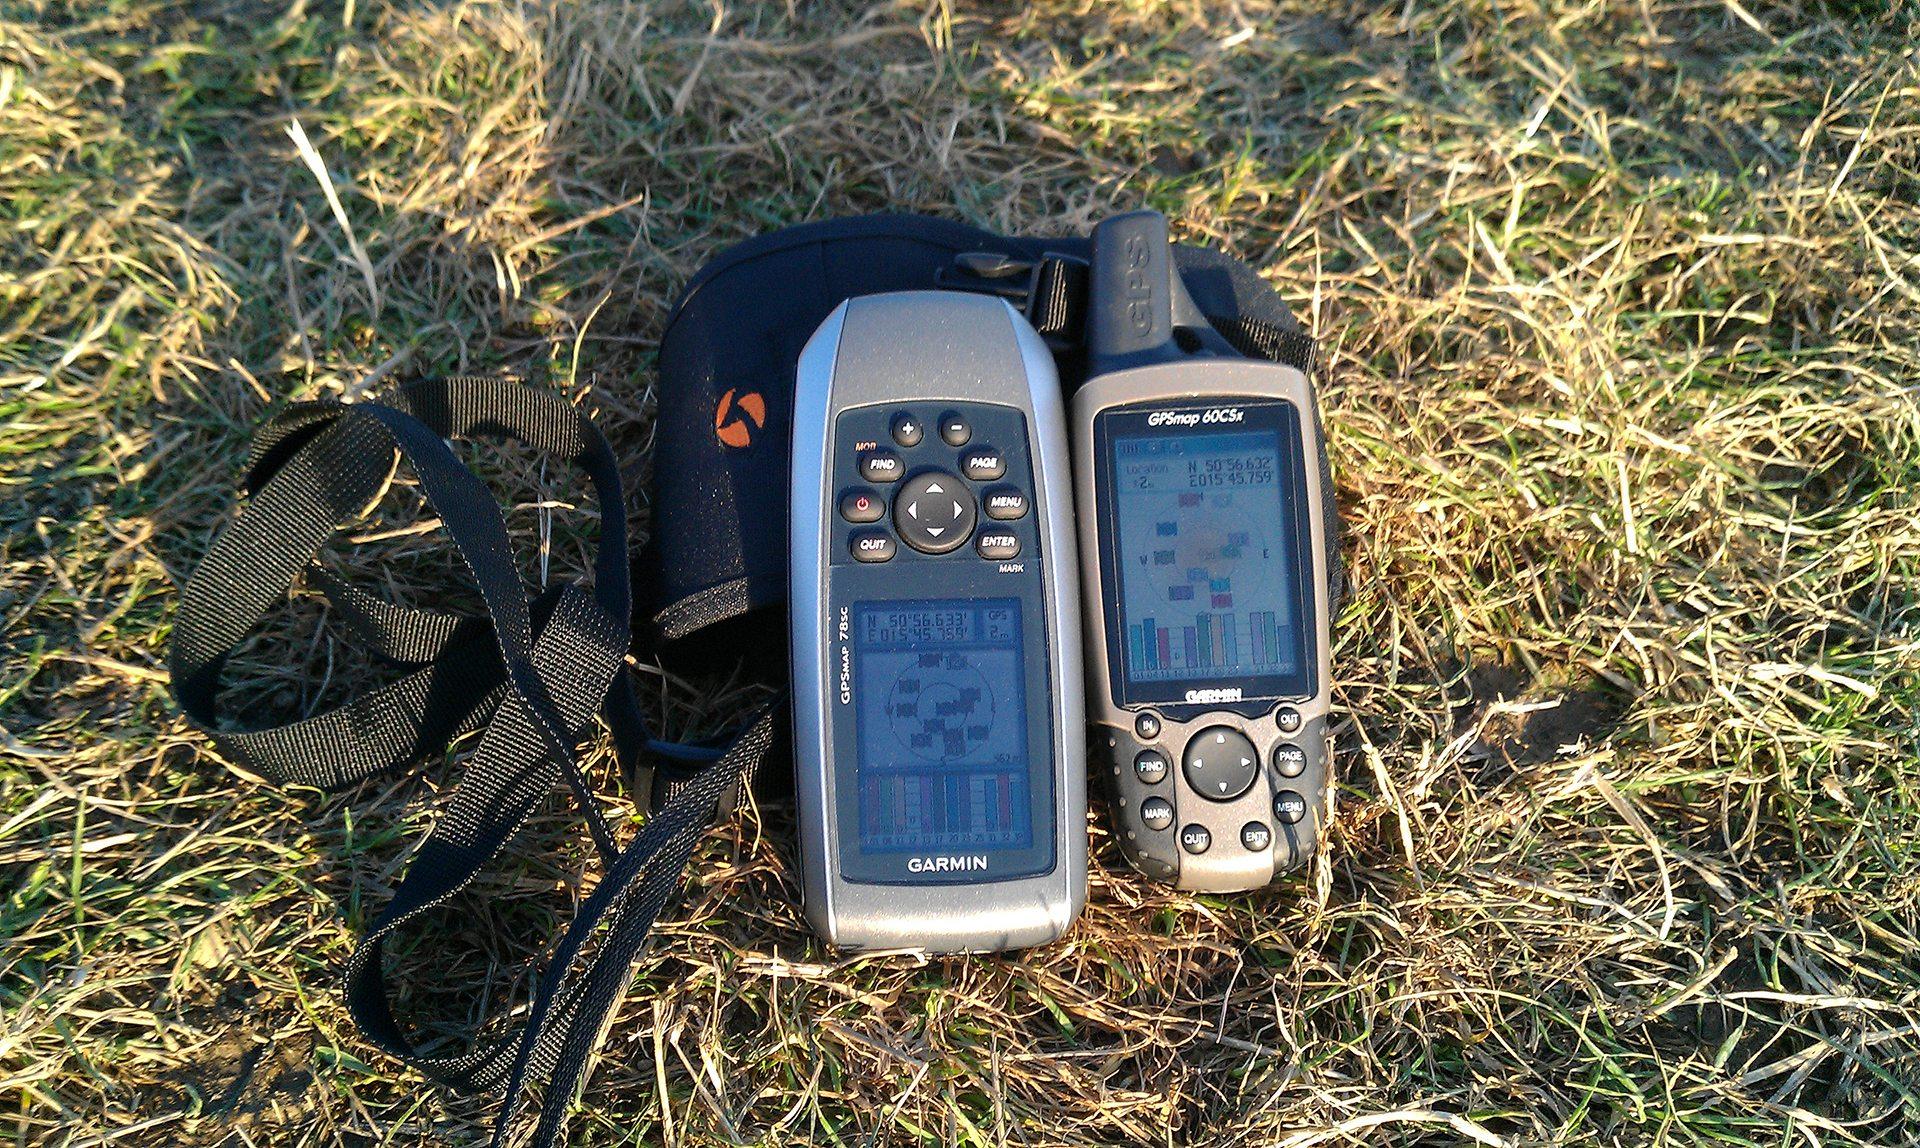 Garmin GPSMAP 78SC i GPSMAP 60 CSx